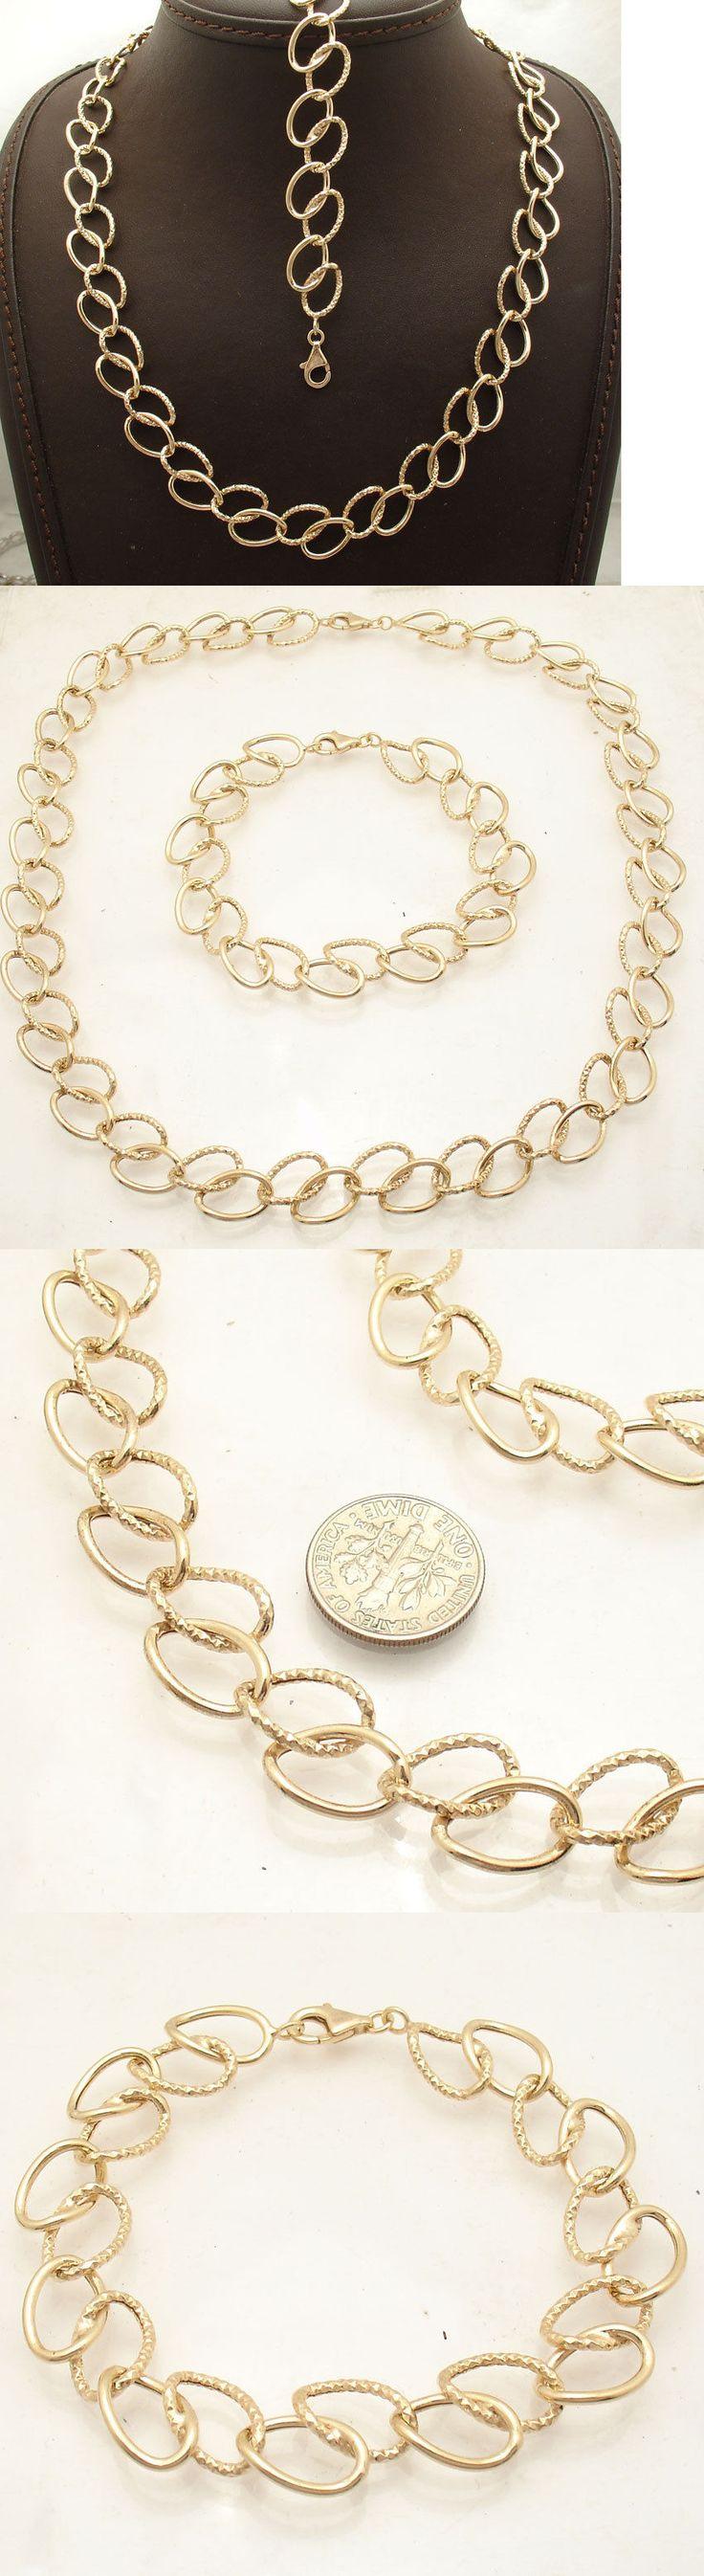 Precious Metal without Stones 164325: Technibond Diamond Cut Curb Bracelet Necklace Set 14K Yellow Gold Clad Silver BUY IT NOW ONLY: $65.87